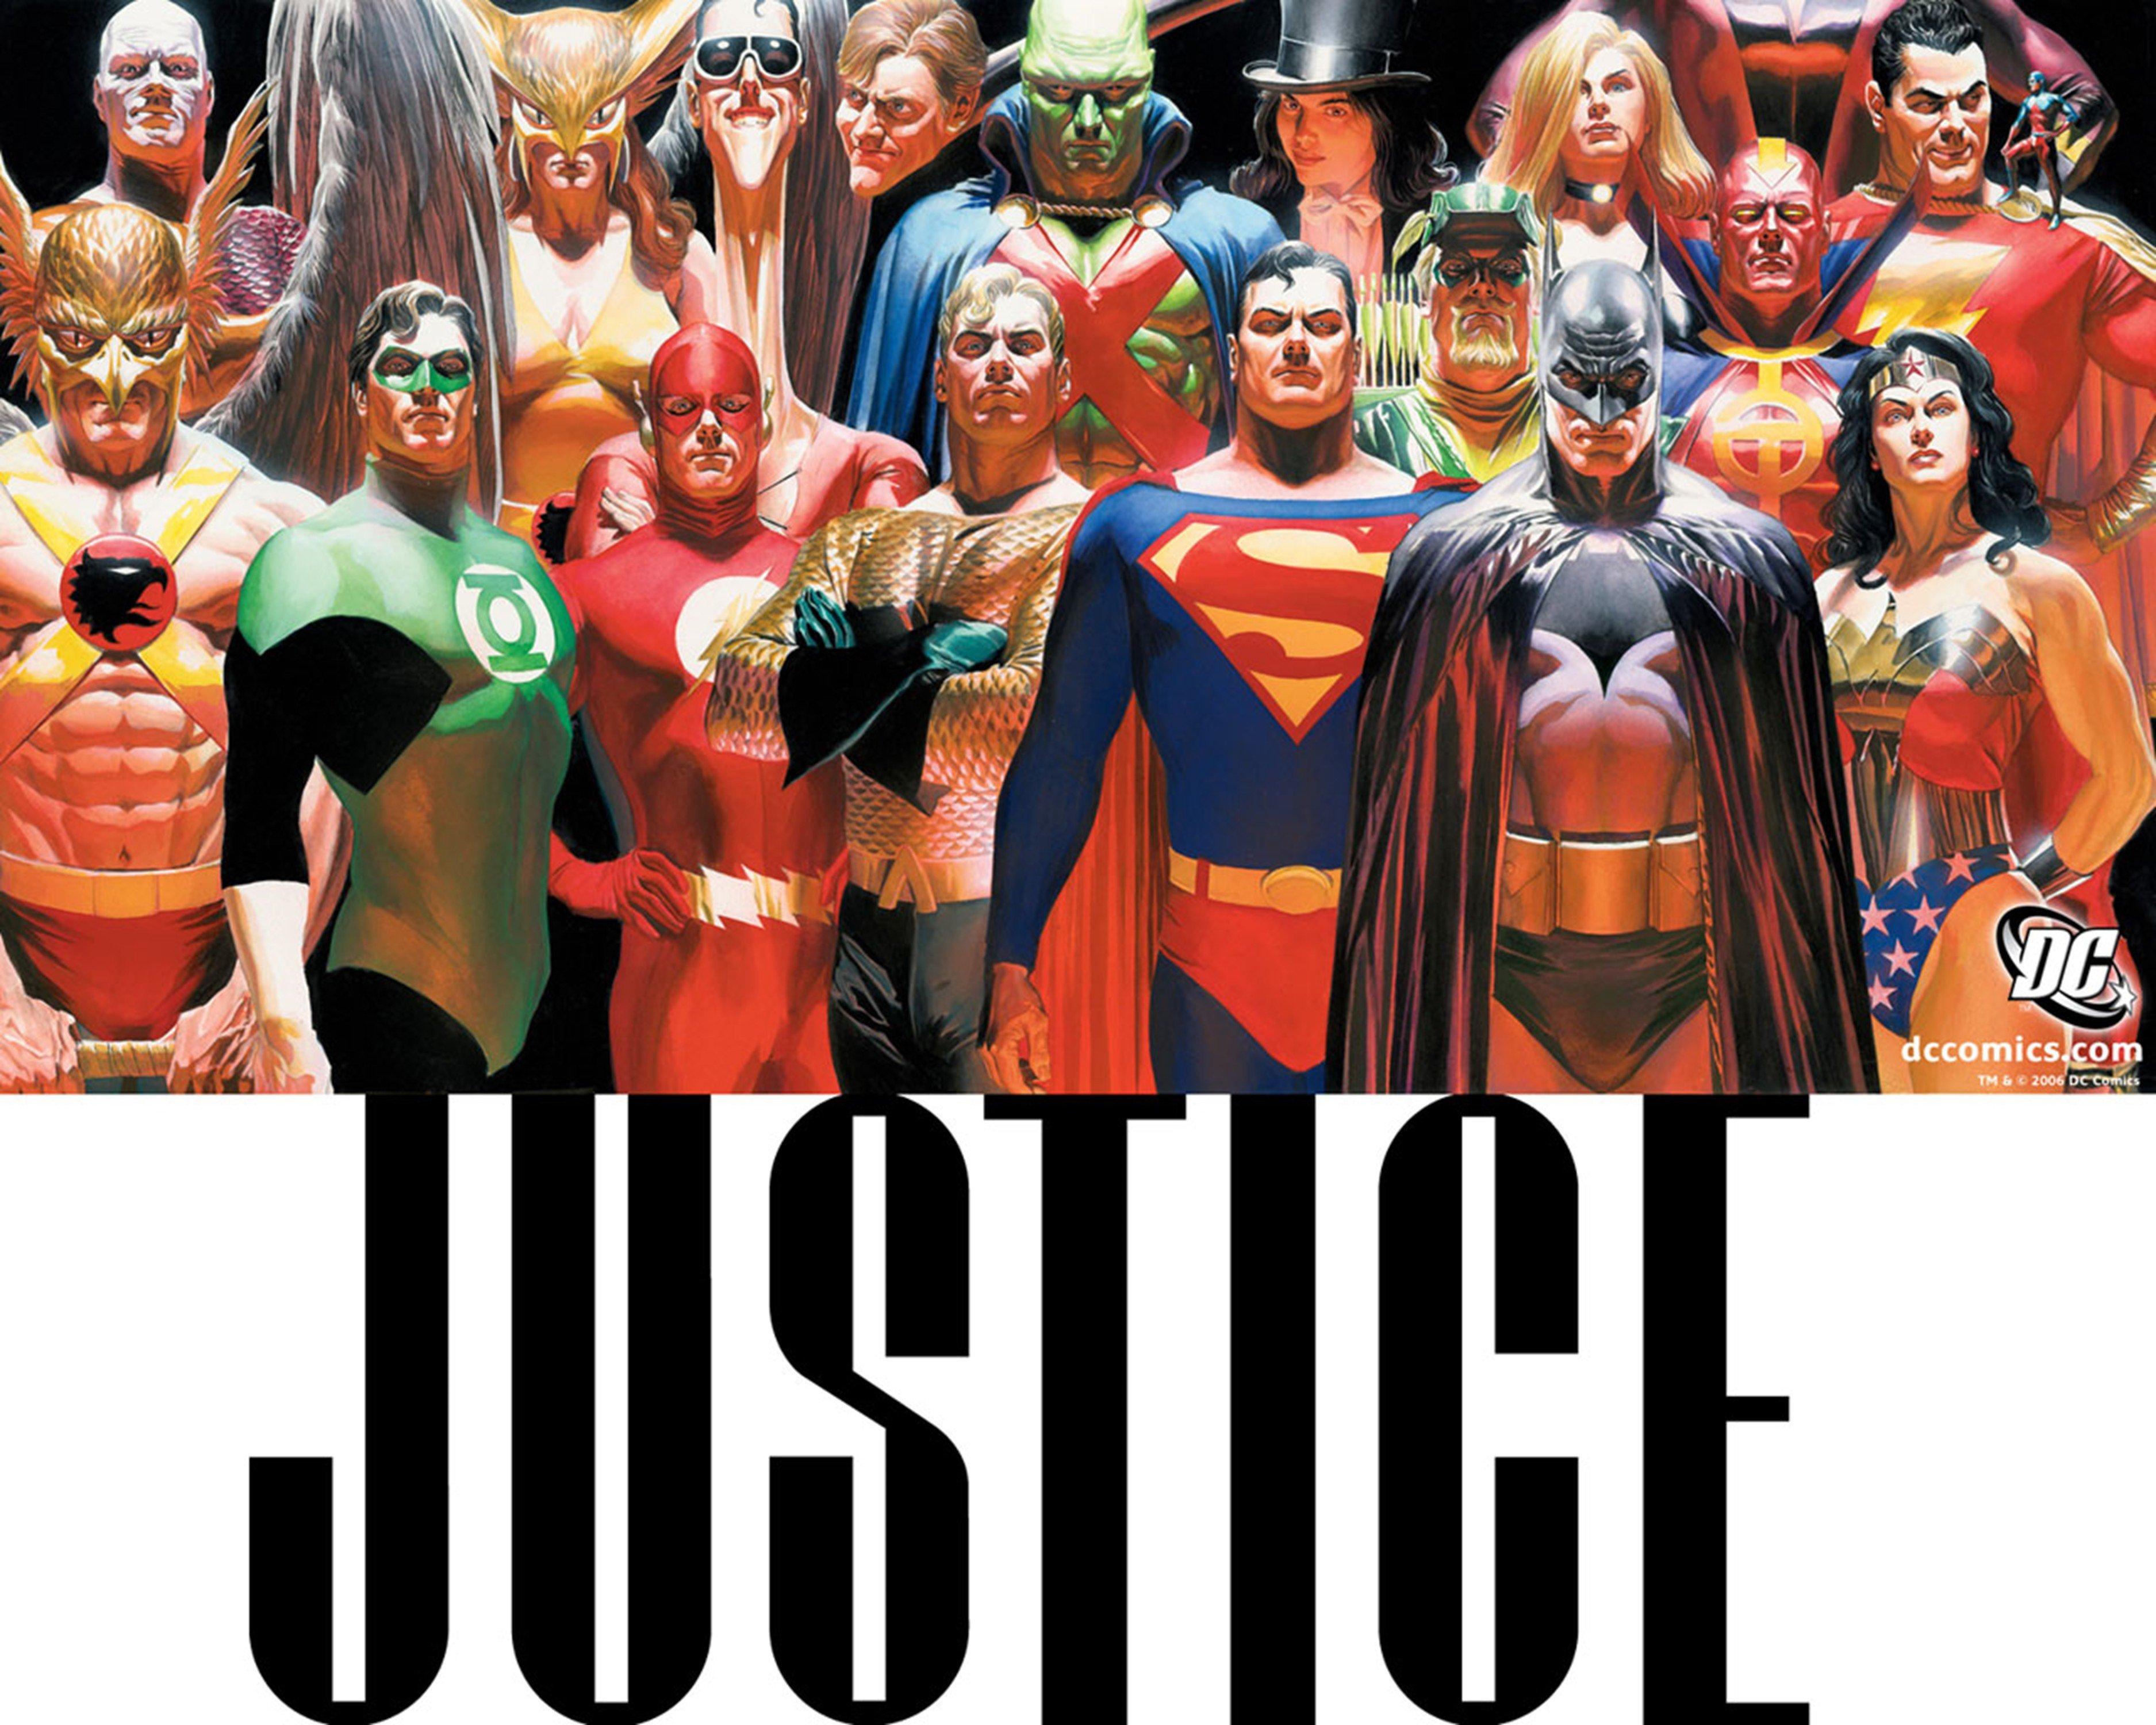 Justice League Dc Comics Superheroes Wallpapers: Dc-comics Justice-league Superheroes Comics Wallpaper